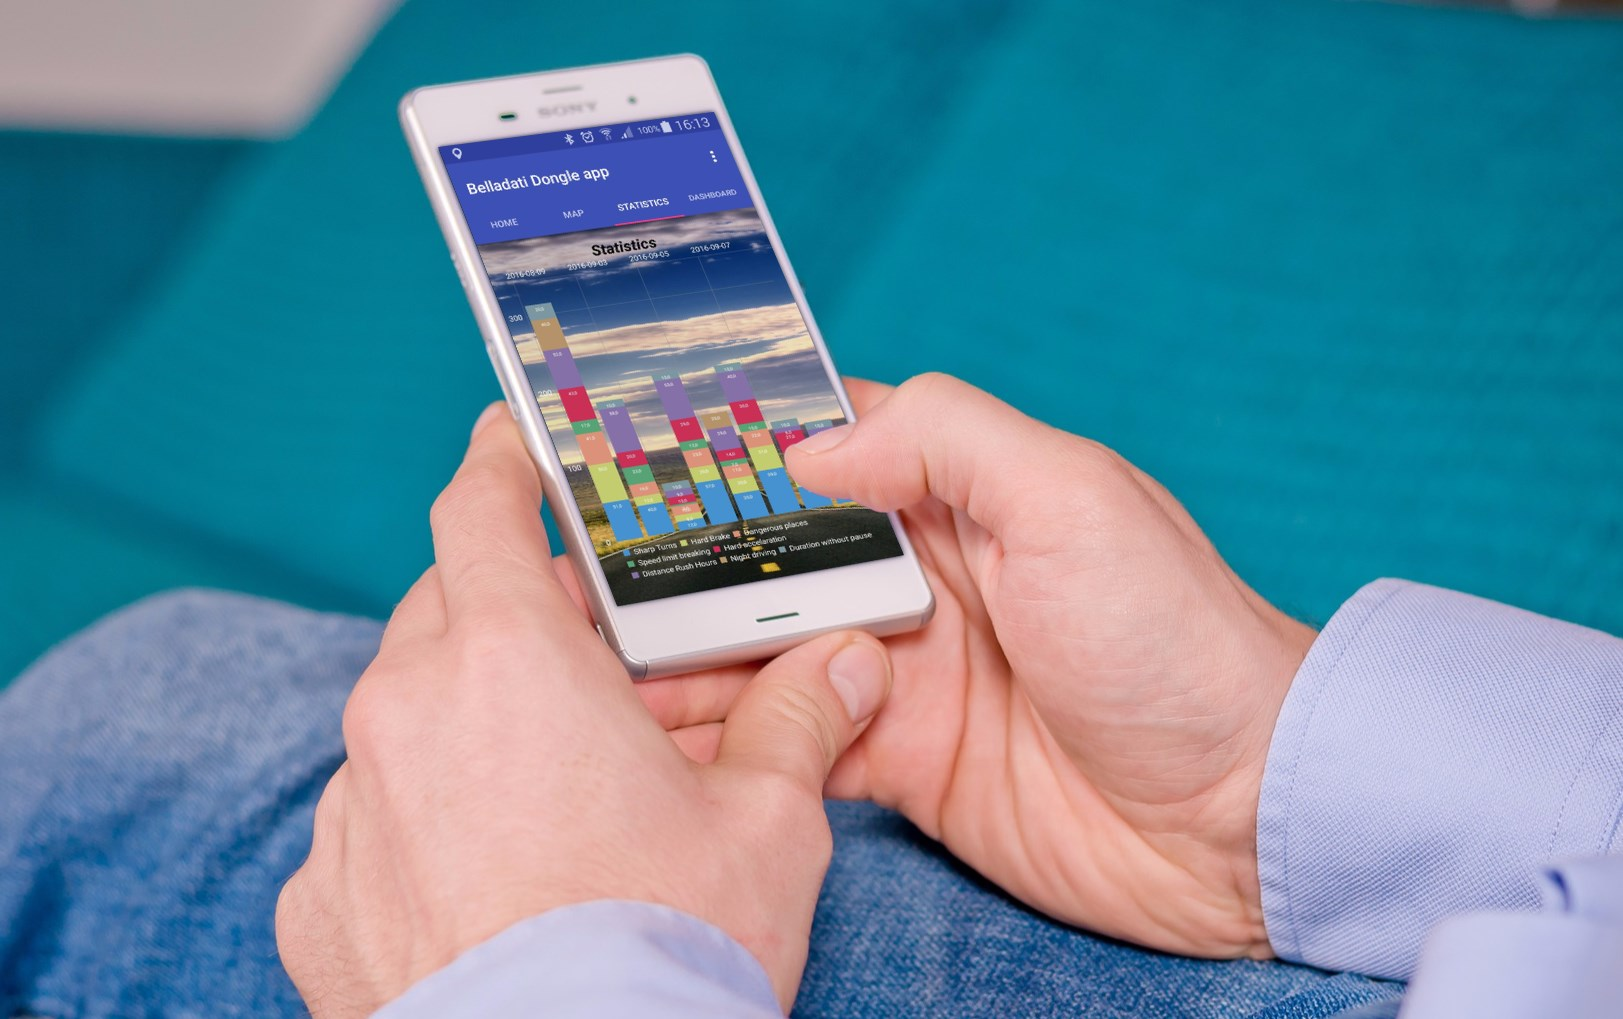 BellaDati Android Mobile Block for Charts